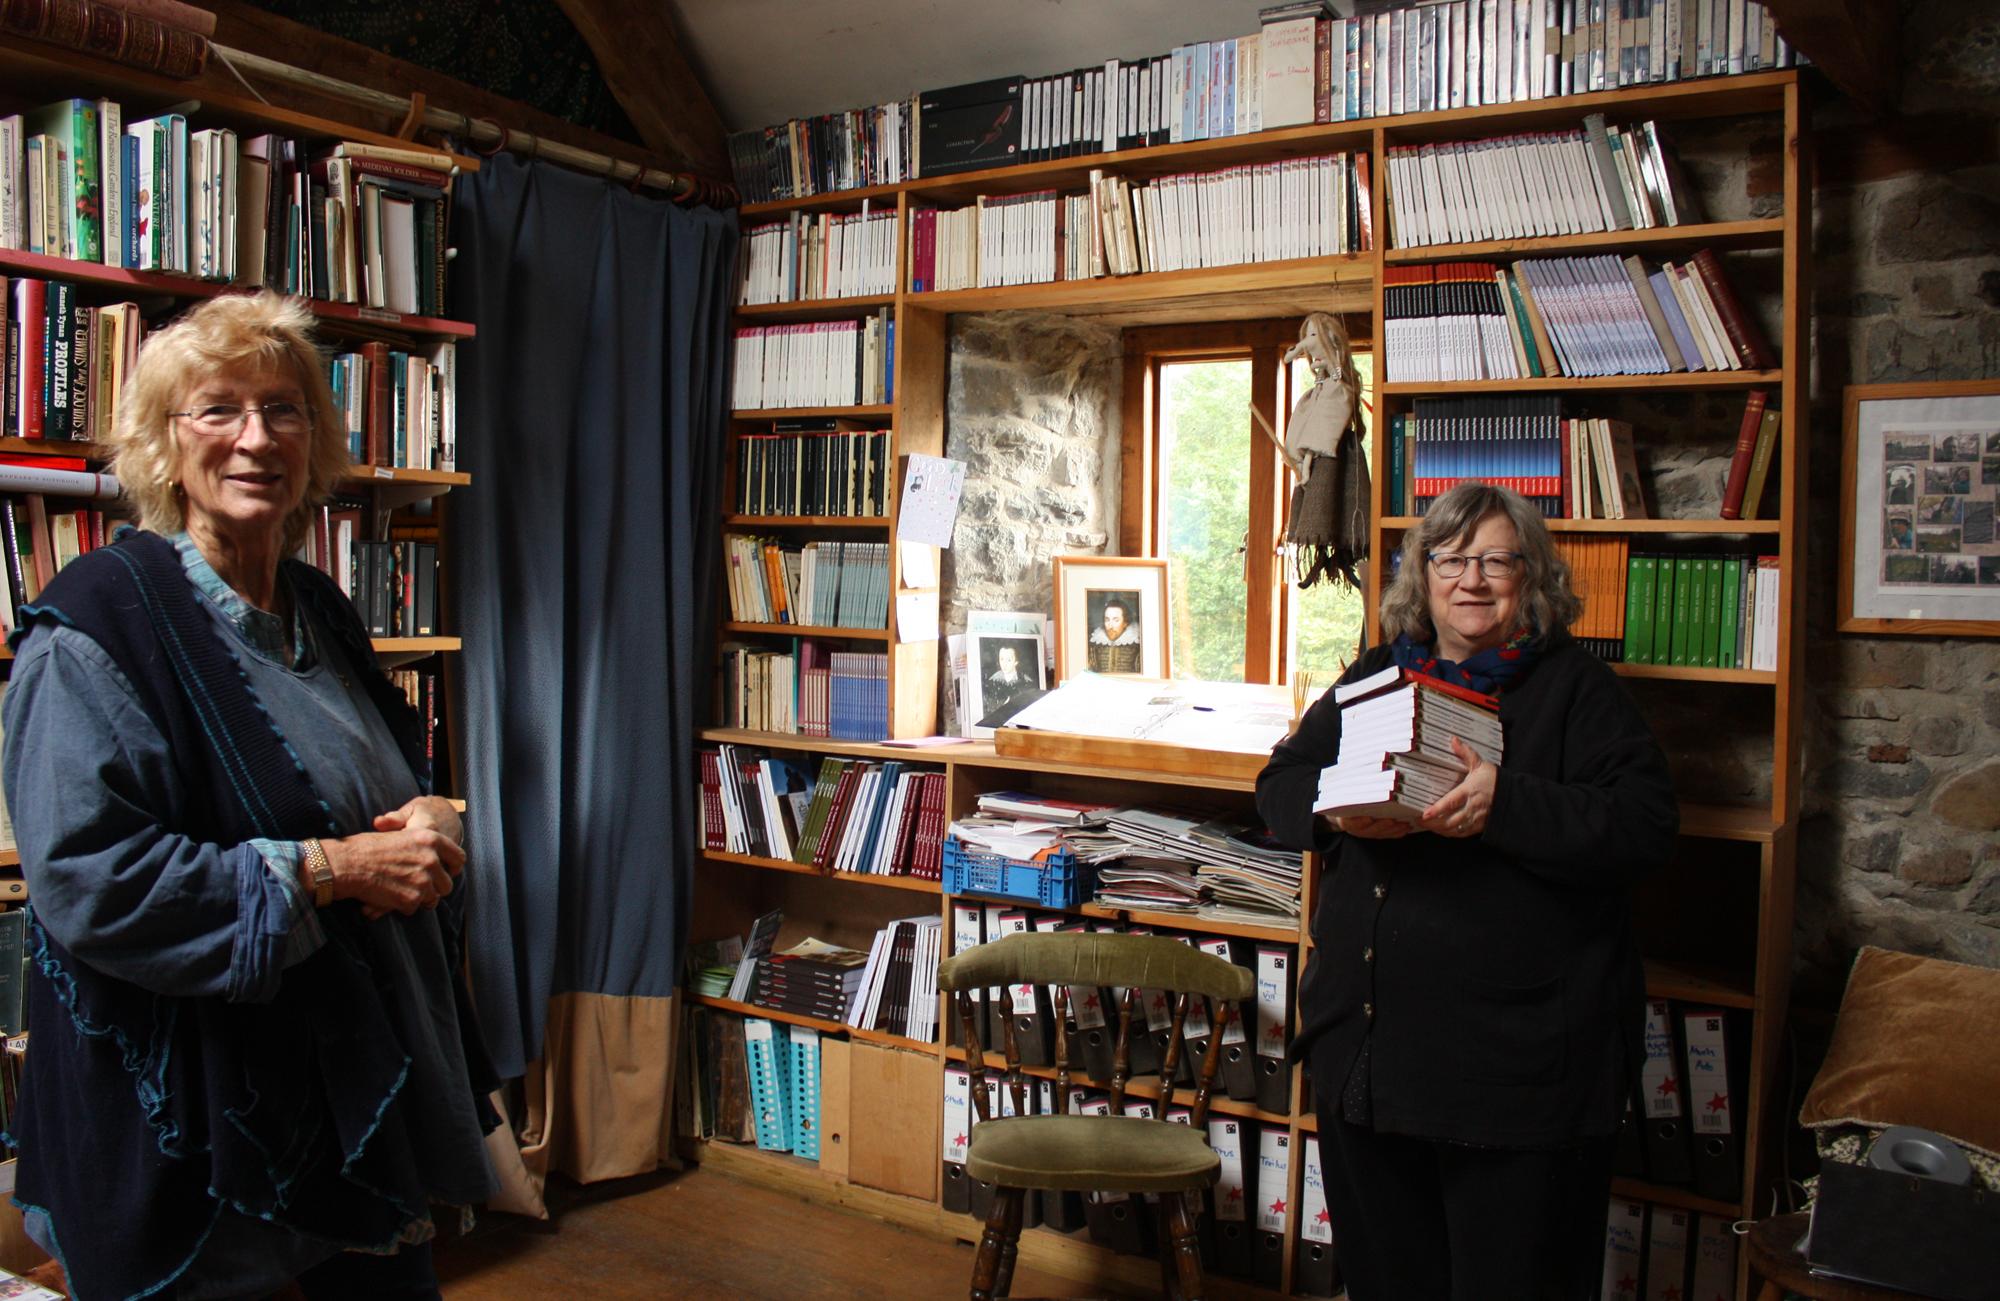 2017 March 13th Penlanole library Dav and Sue (77) copy (1).jpg